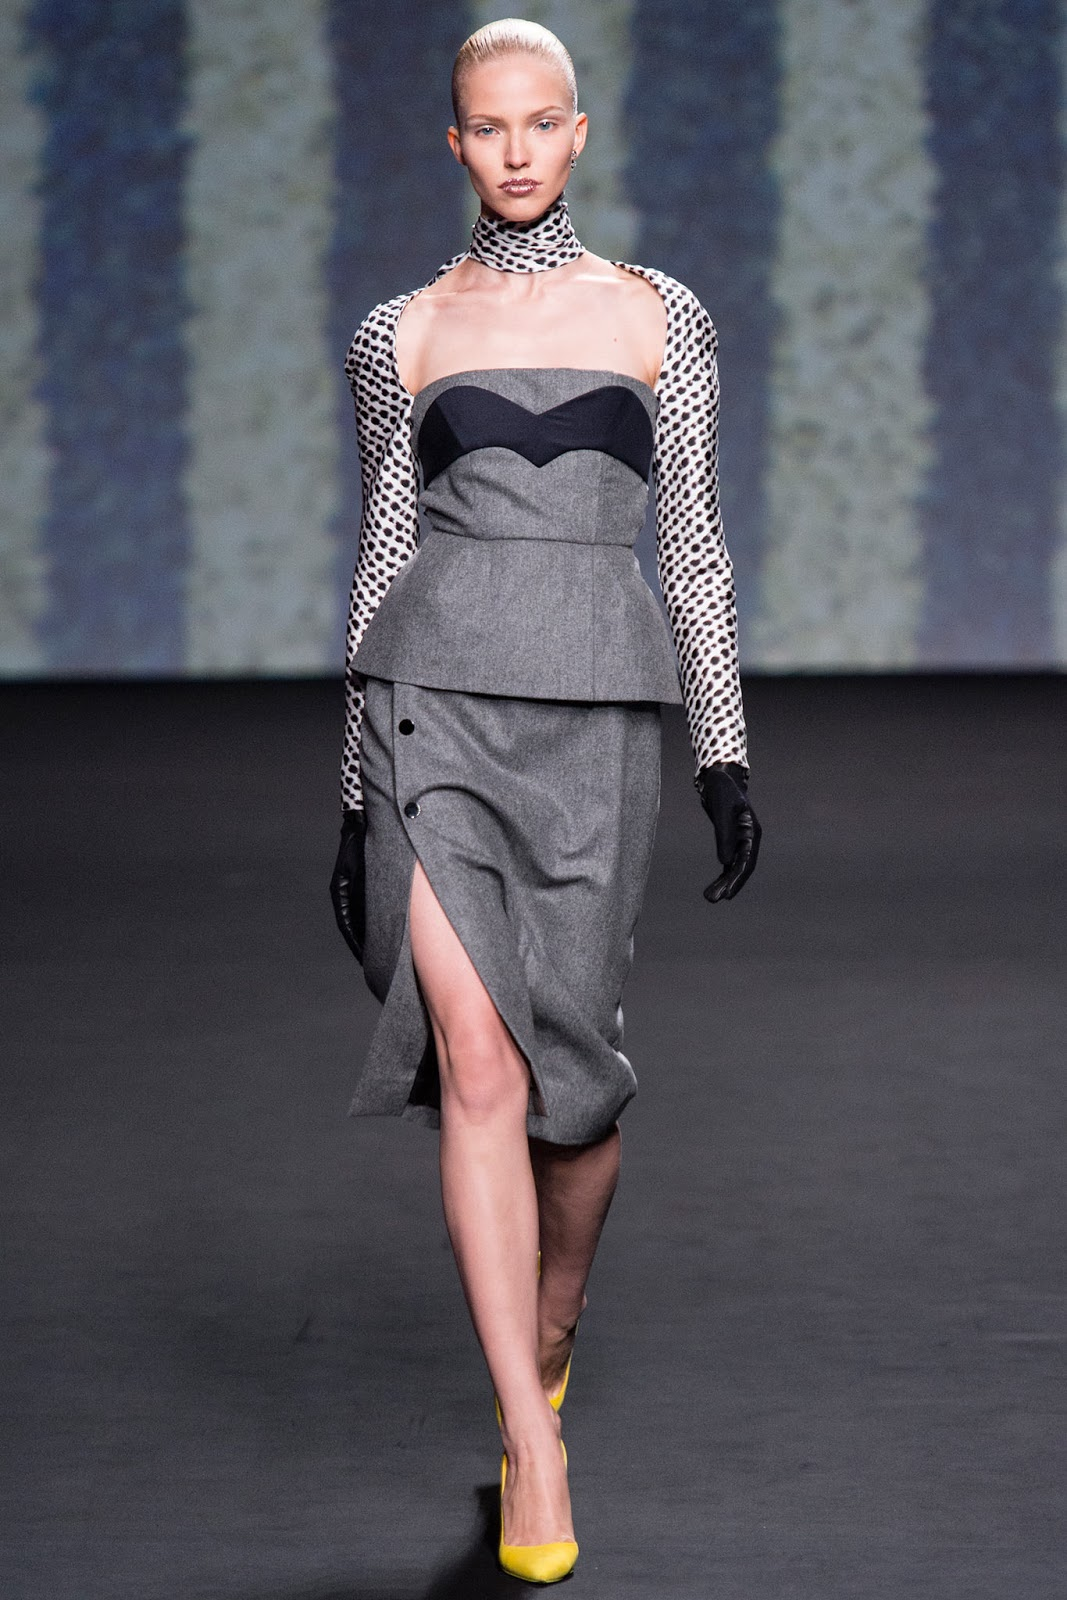 Christian dior haute couture fall winter 2014 for Haute couture winter